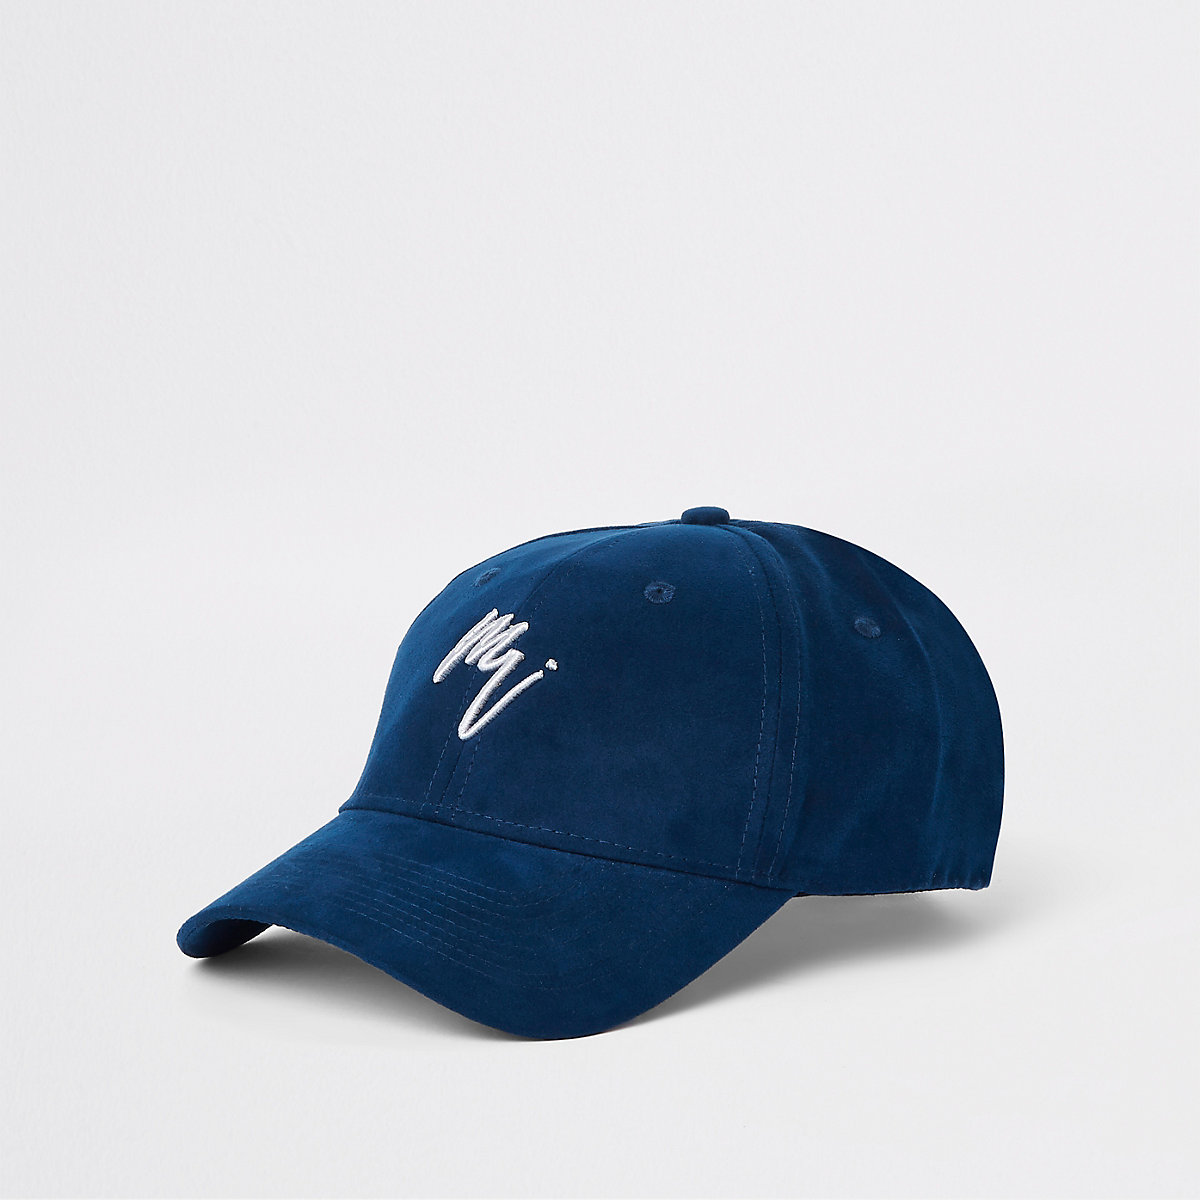 06fdd90ac40 Navy suede  Maison Riviera  baseball cap - Hats   Caps - Accessories - men